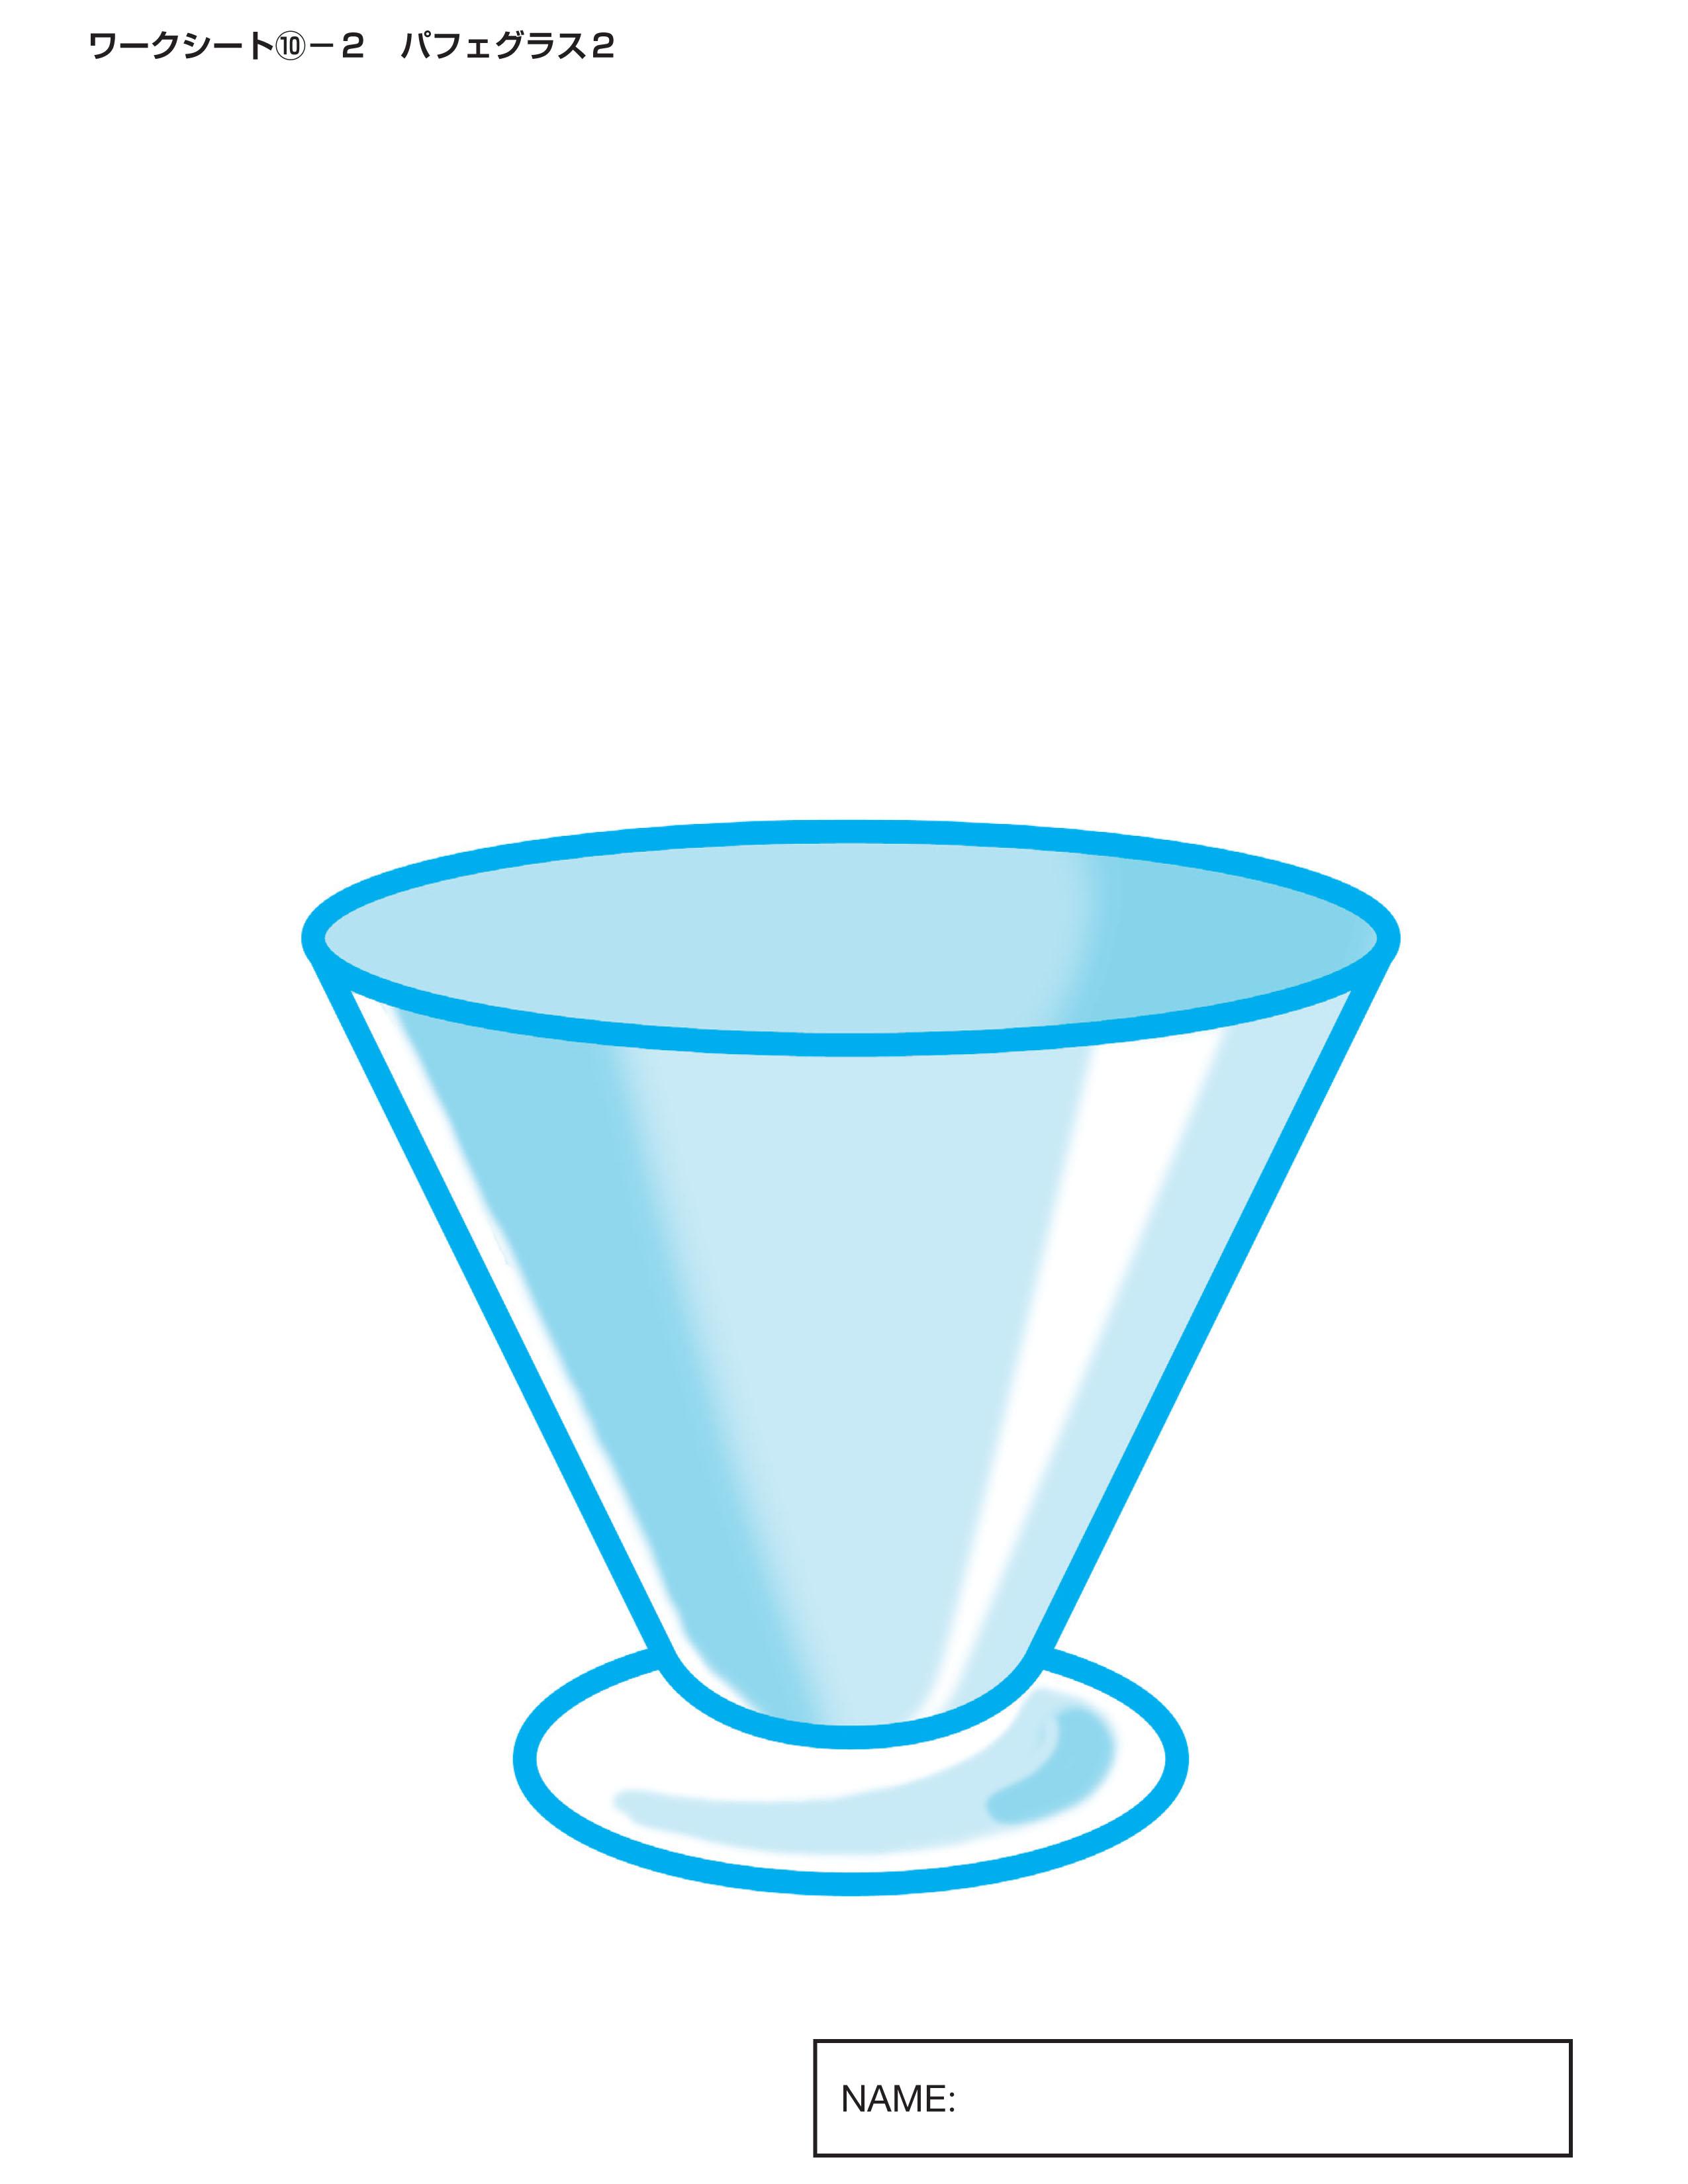 Hifriends1 Worksheet 10 Glass2